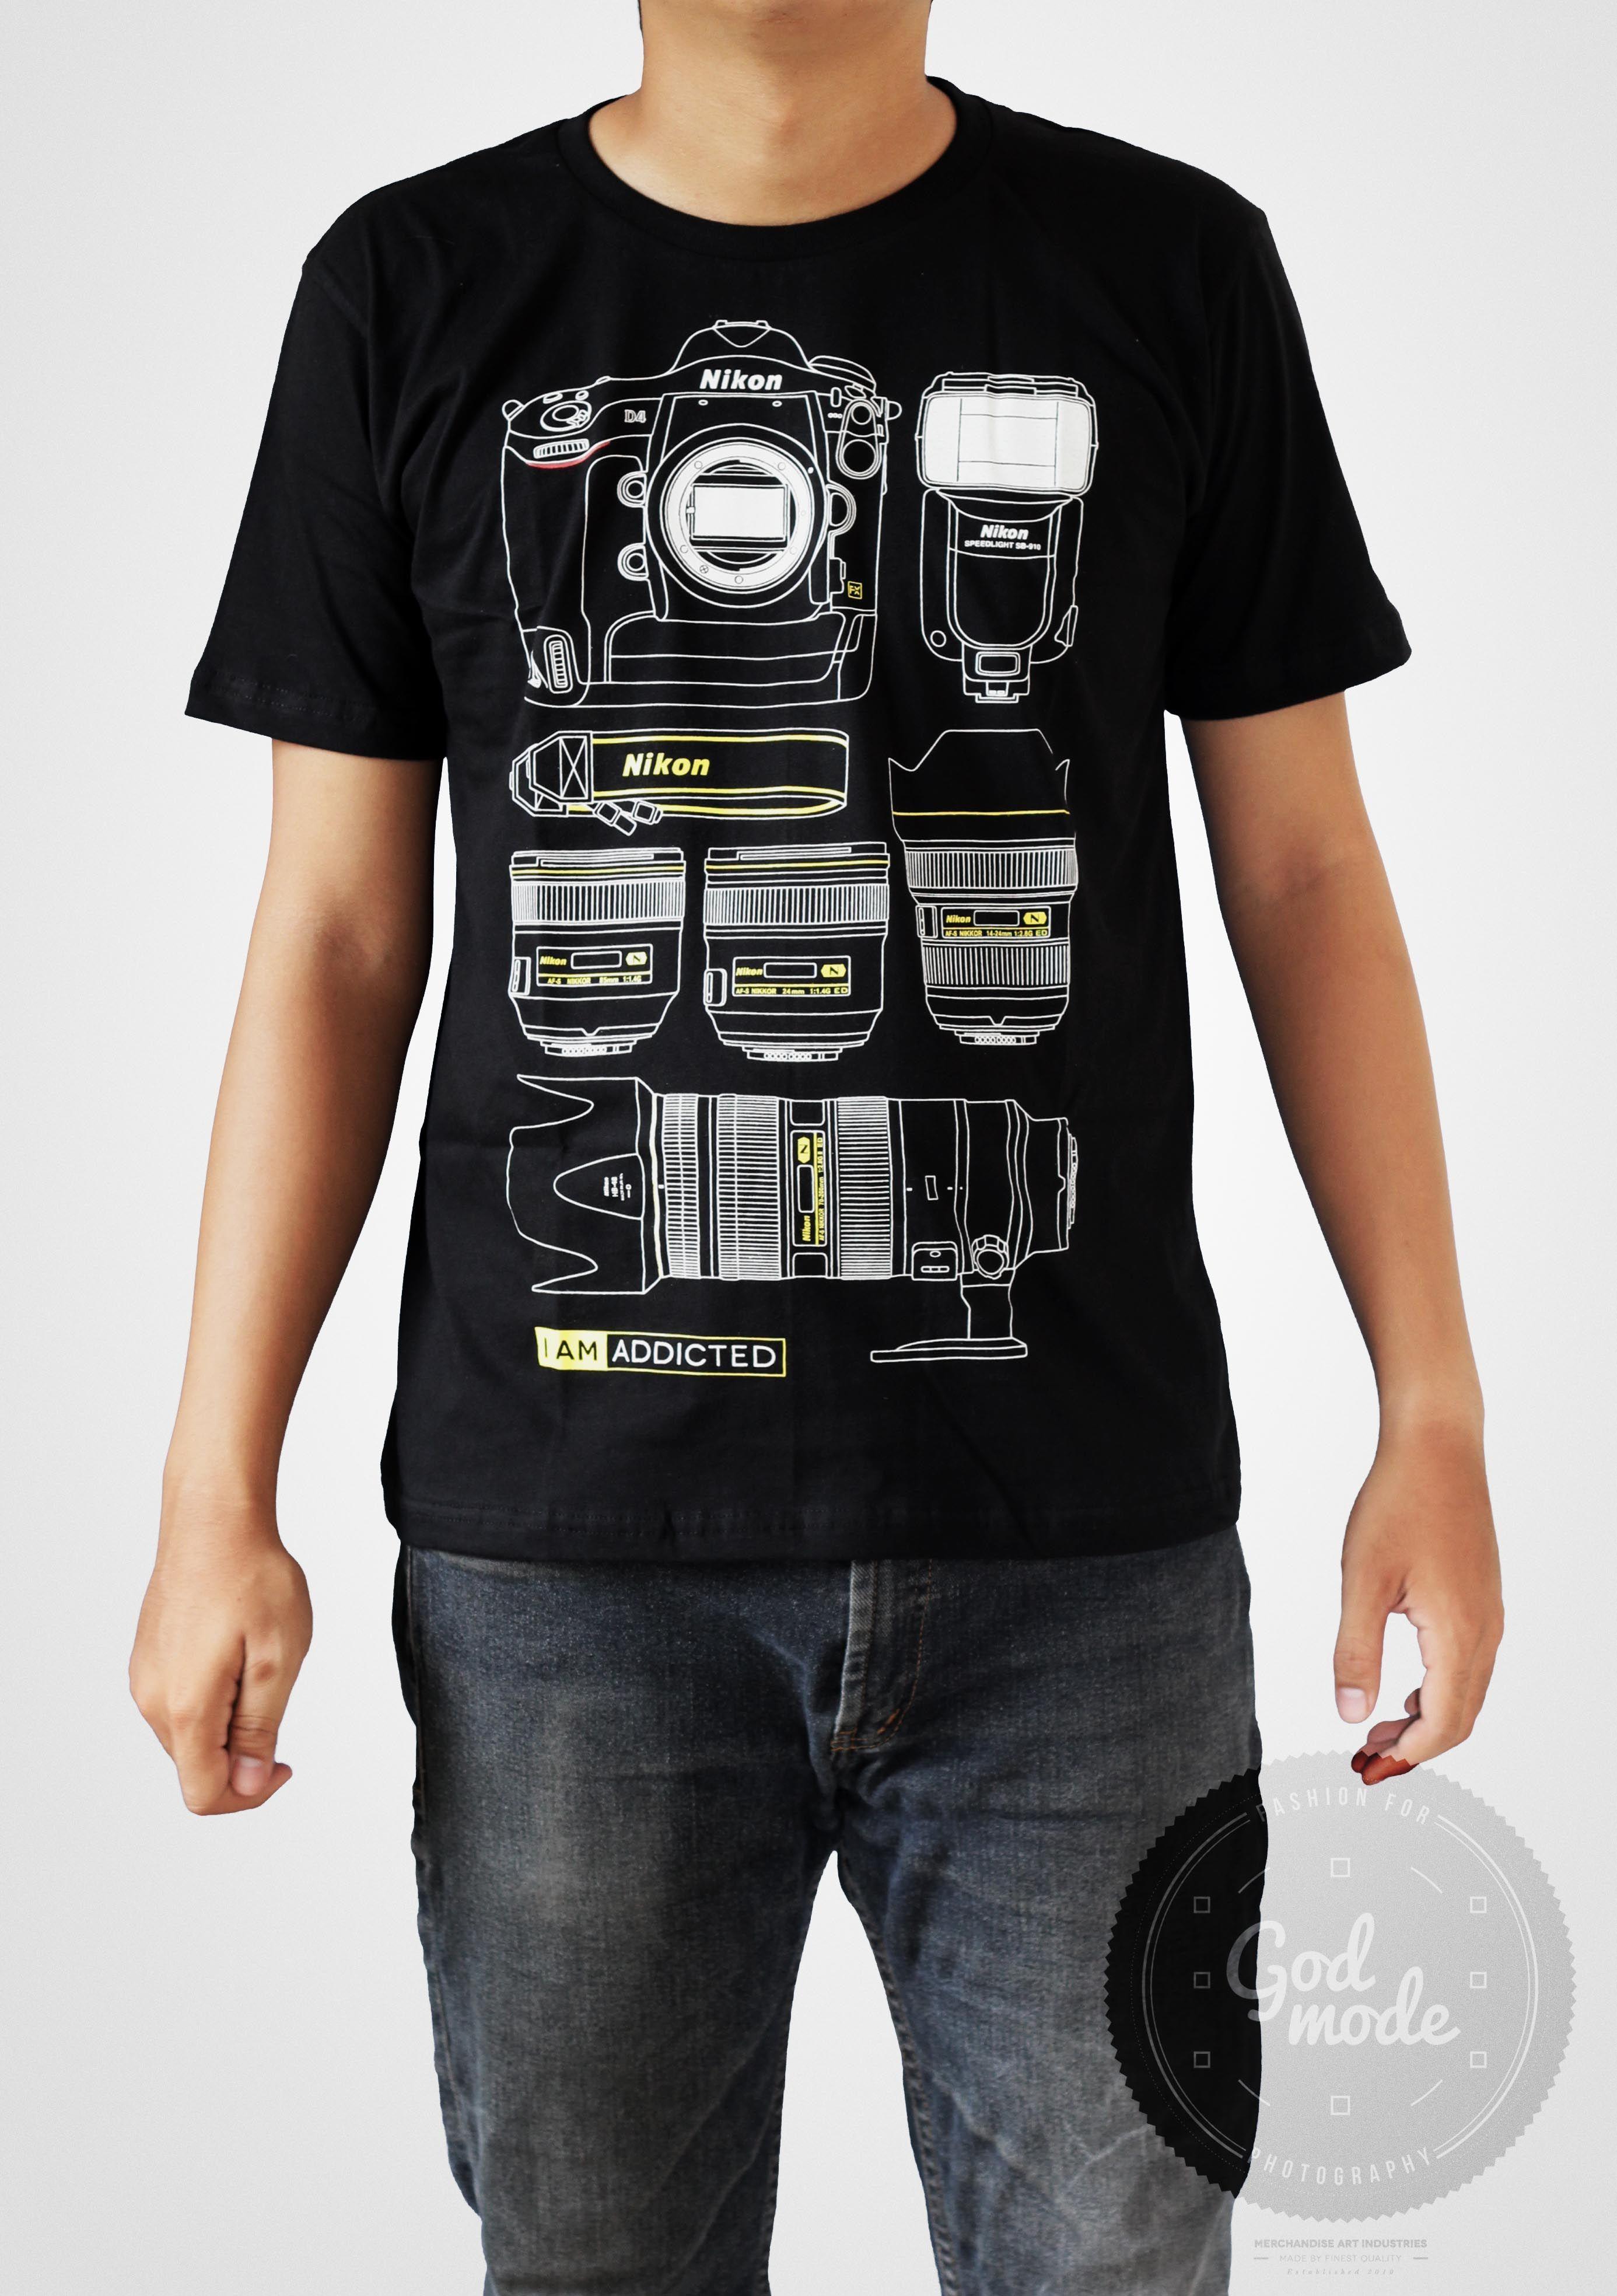 18 Usd Nikon Equipment T Shirt Photography I Am Addicted